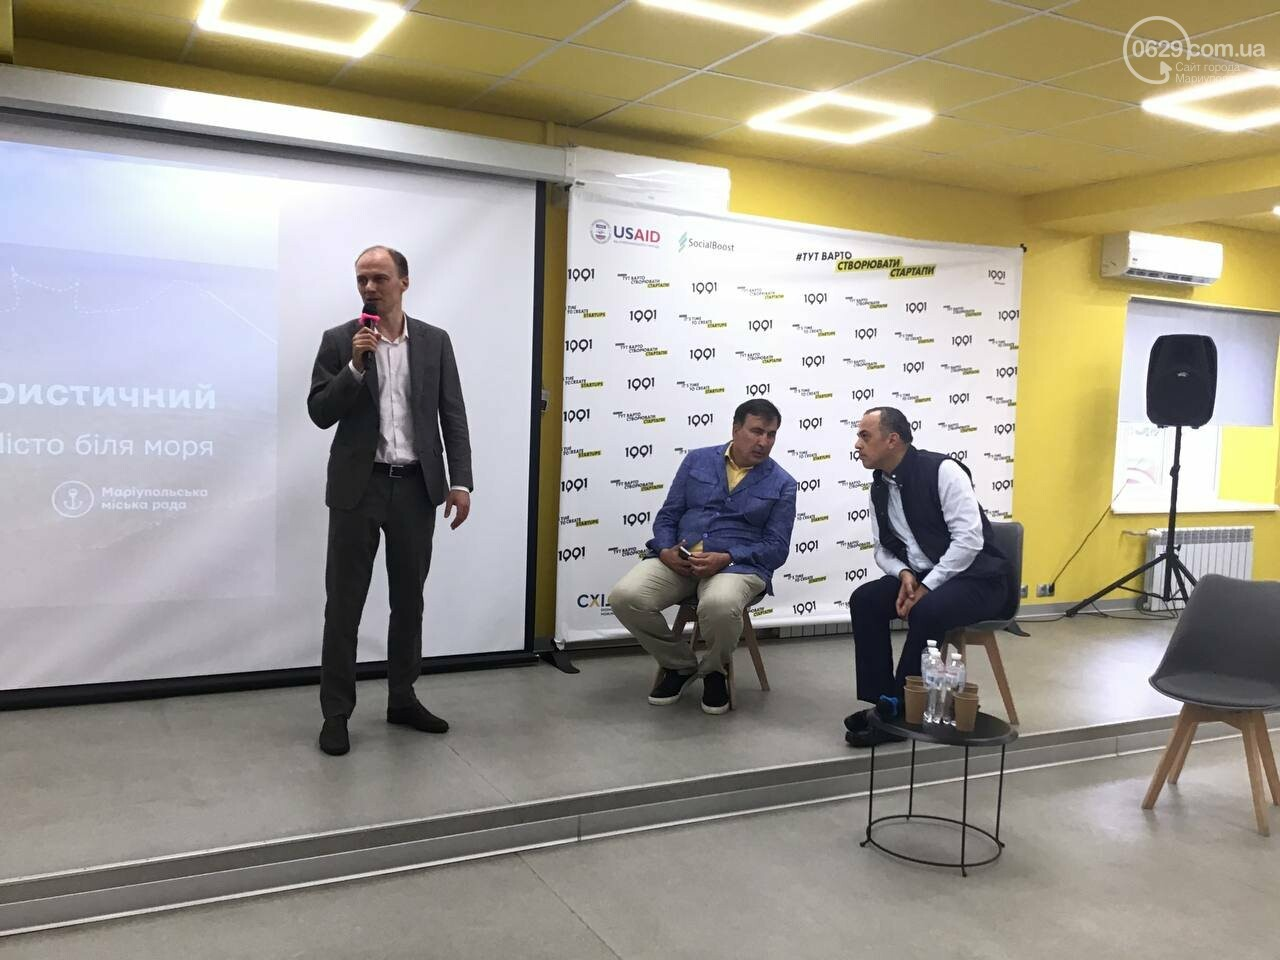 Саакашвили на стуле. Как из Мариуполя хотят сделать Батуми, - ФОТО, фото-2